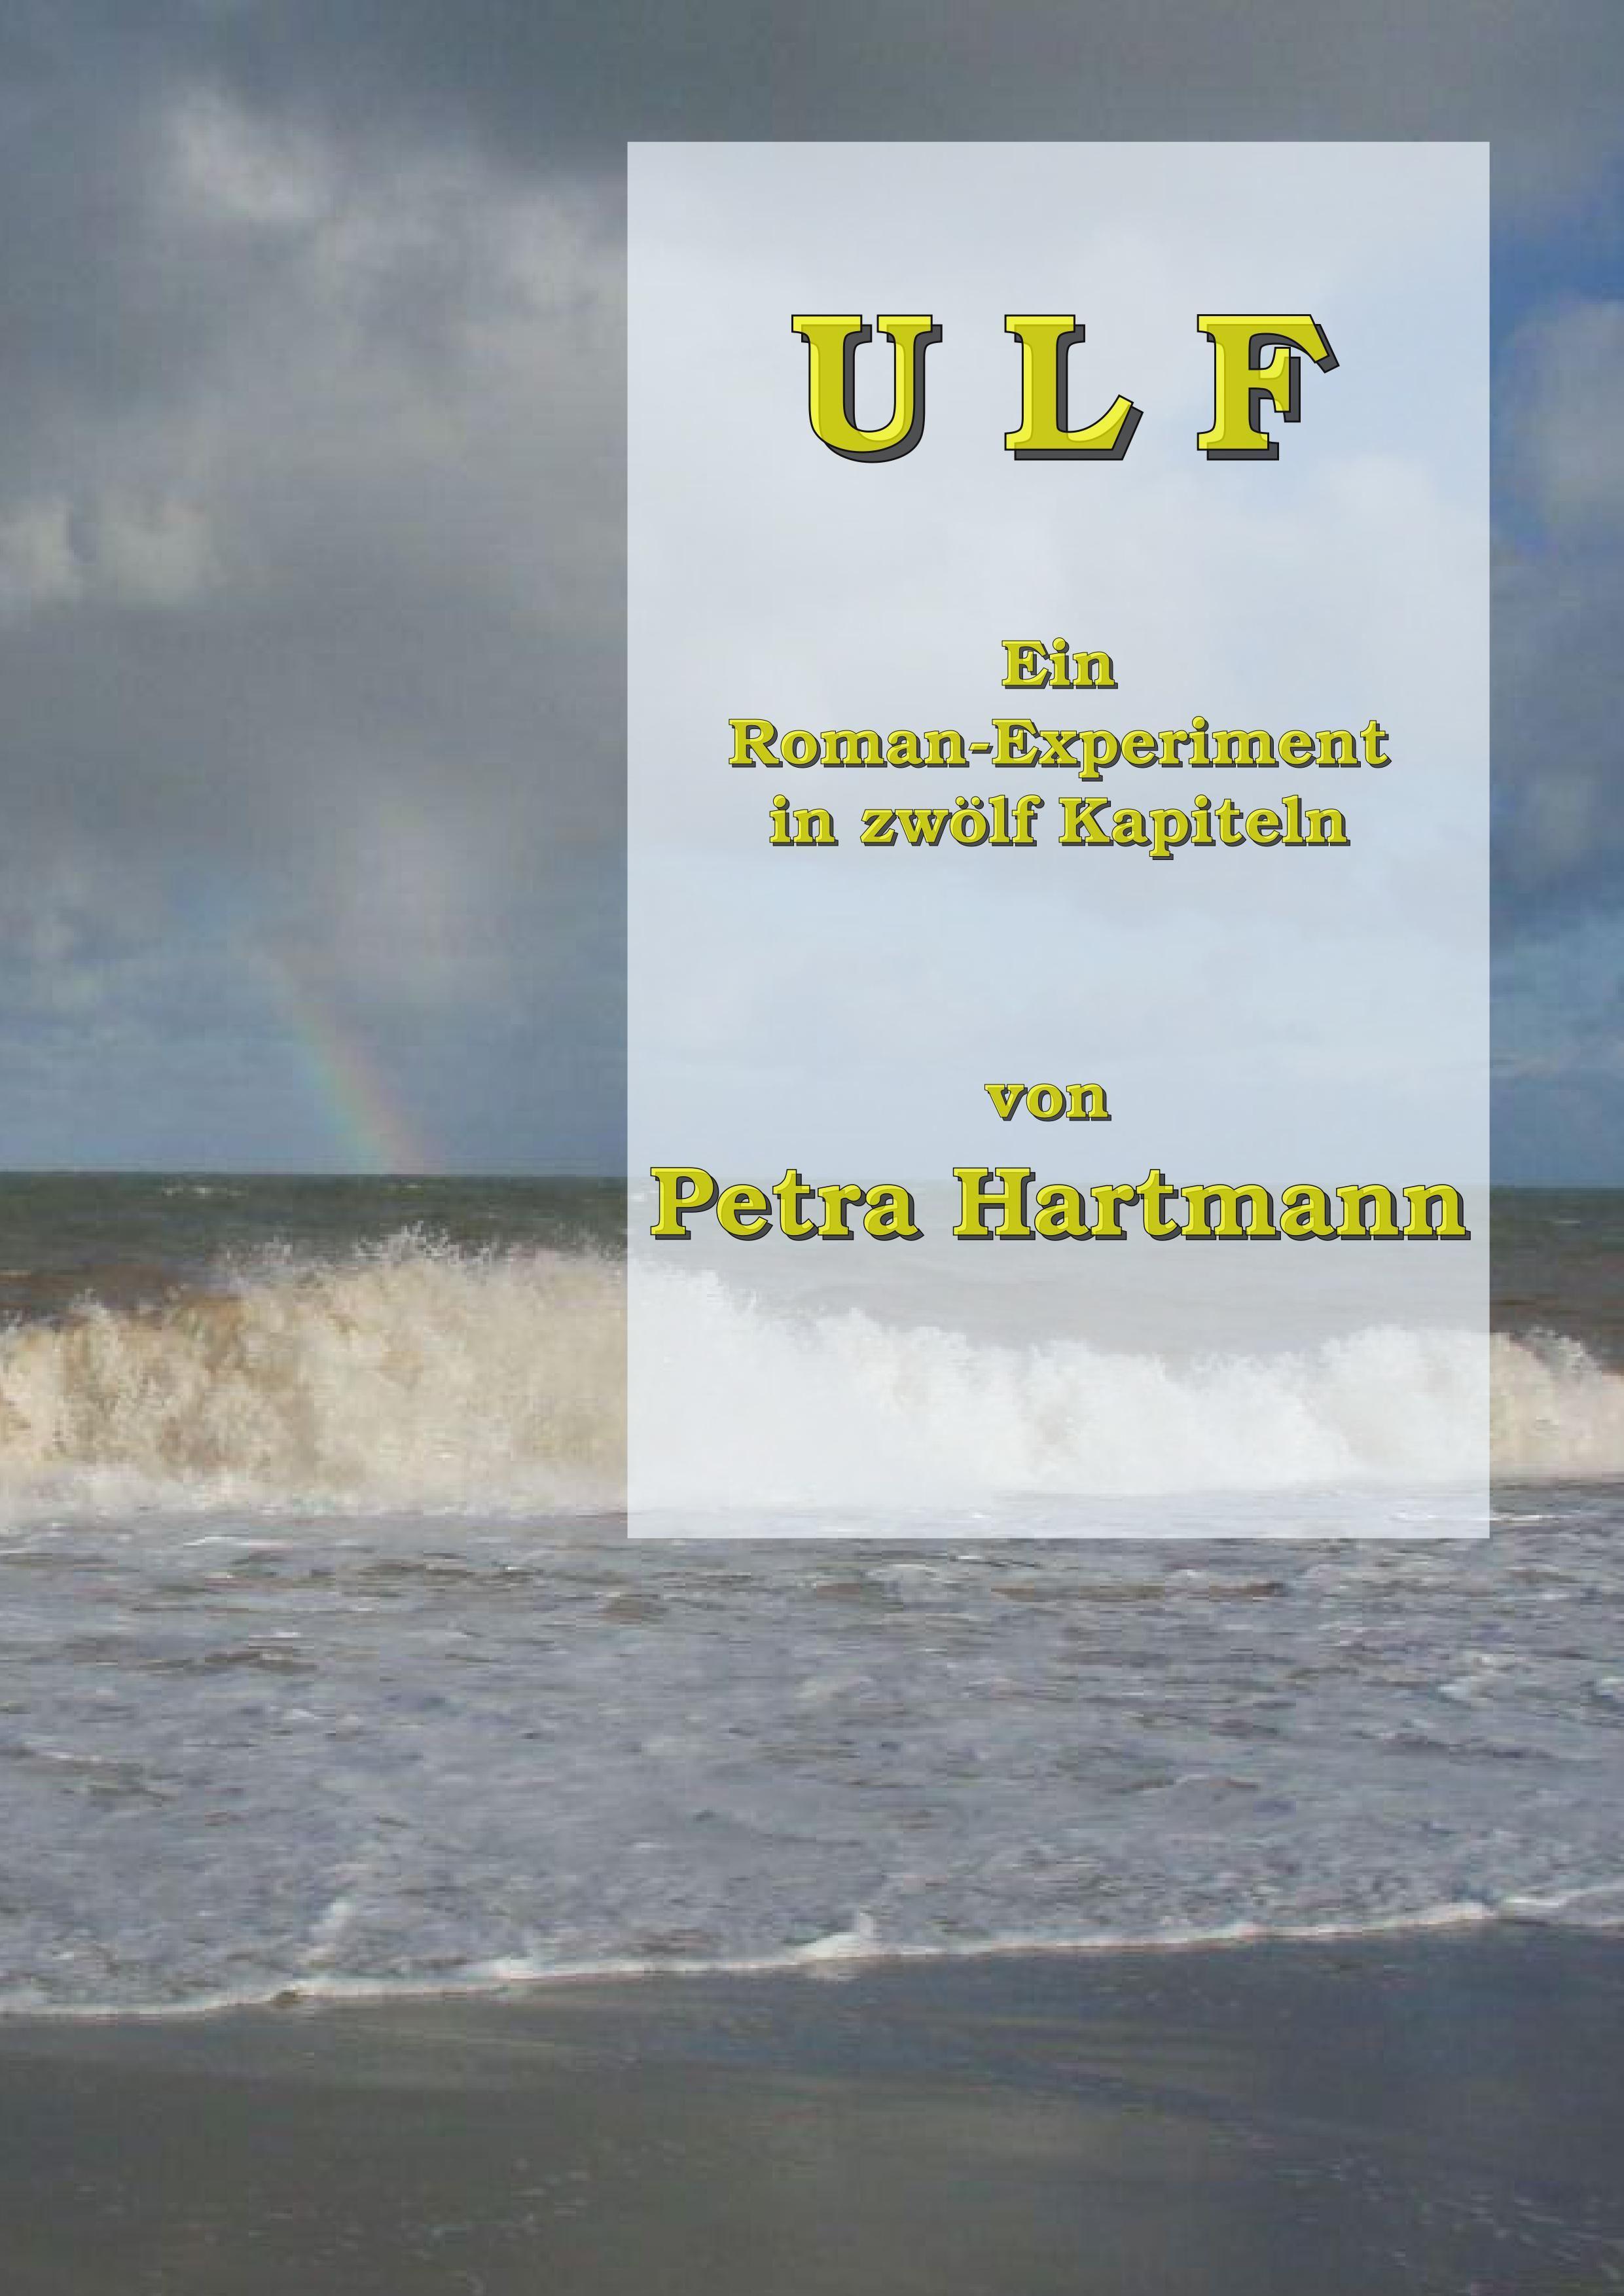 Ulf-Cover2.jpg